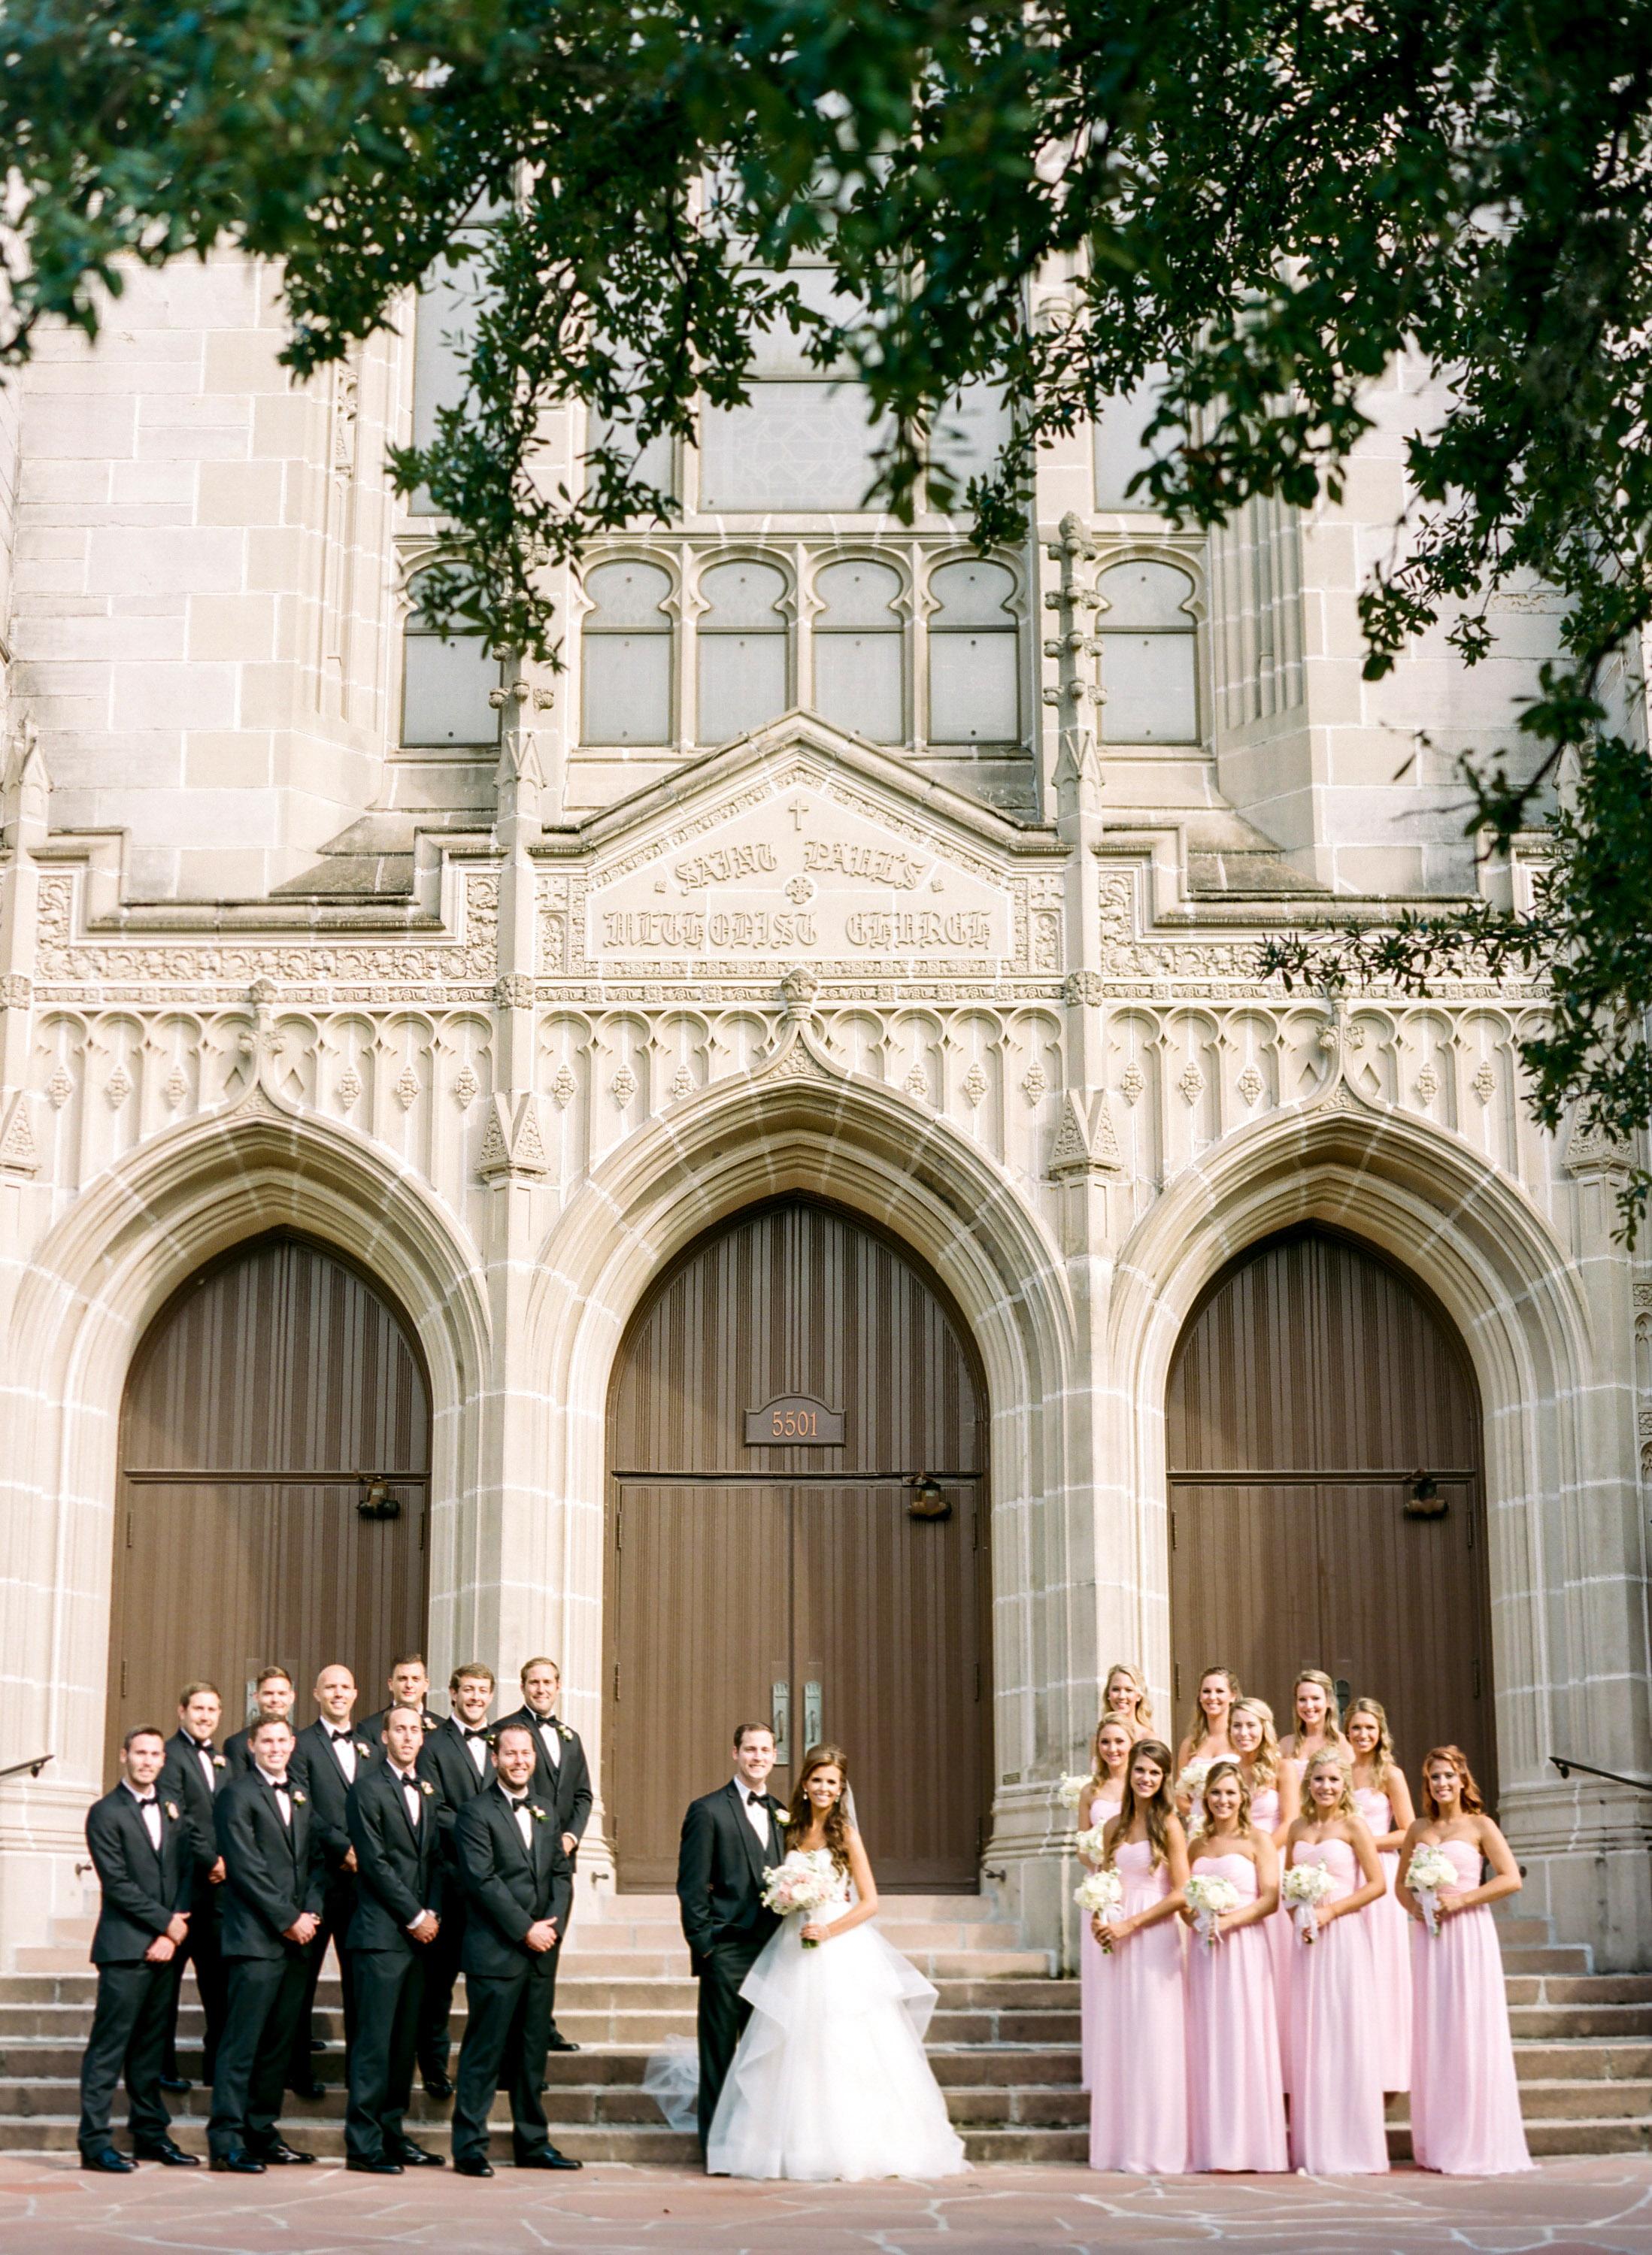 Dana-Fernandez-Photography-Weddings-in-Houston-Magazine-feature-Houston-wedding-photographer-film-24.jpg